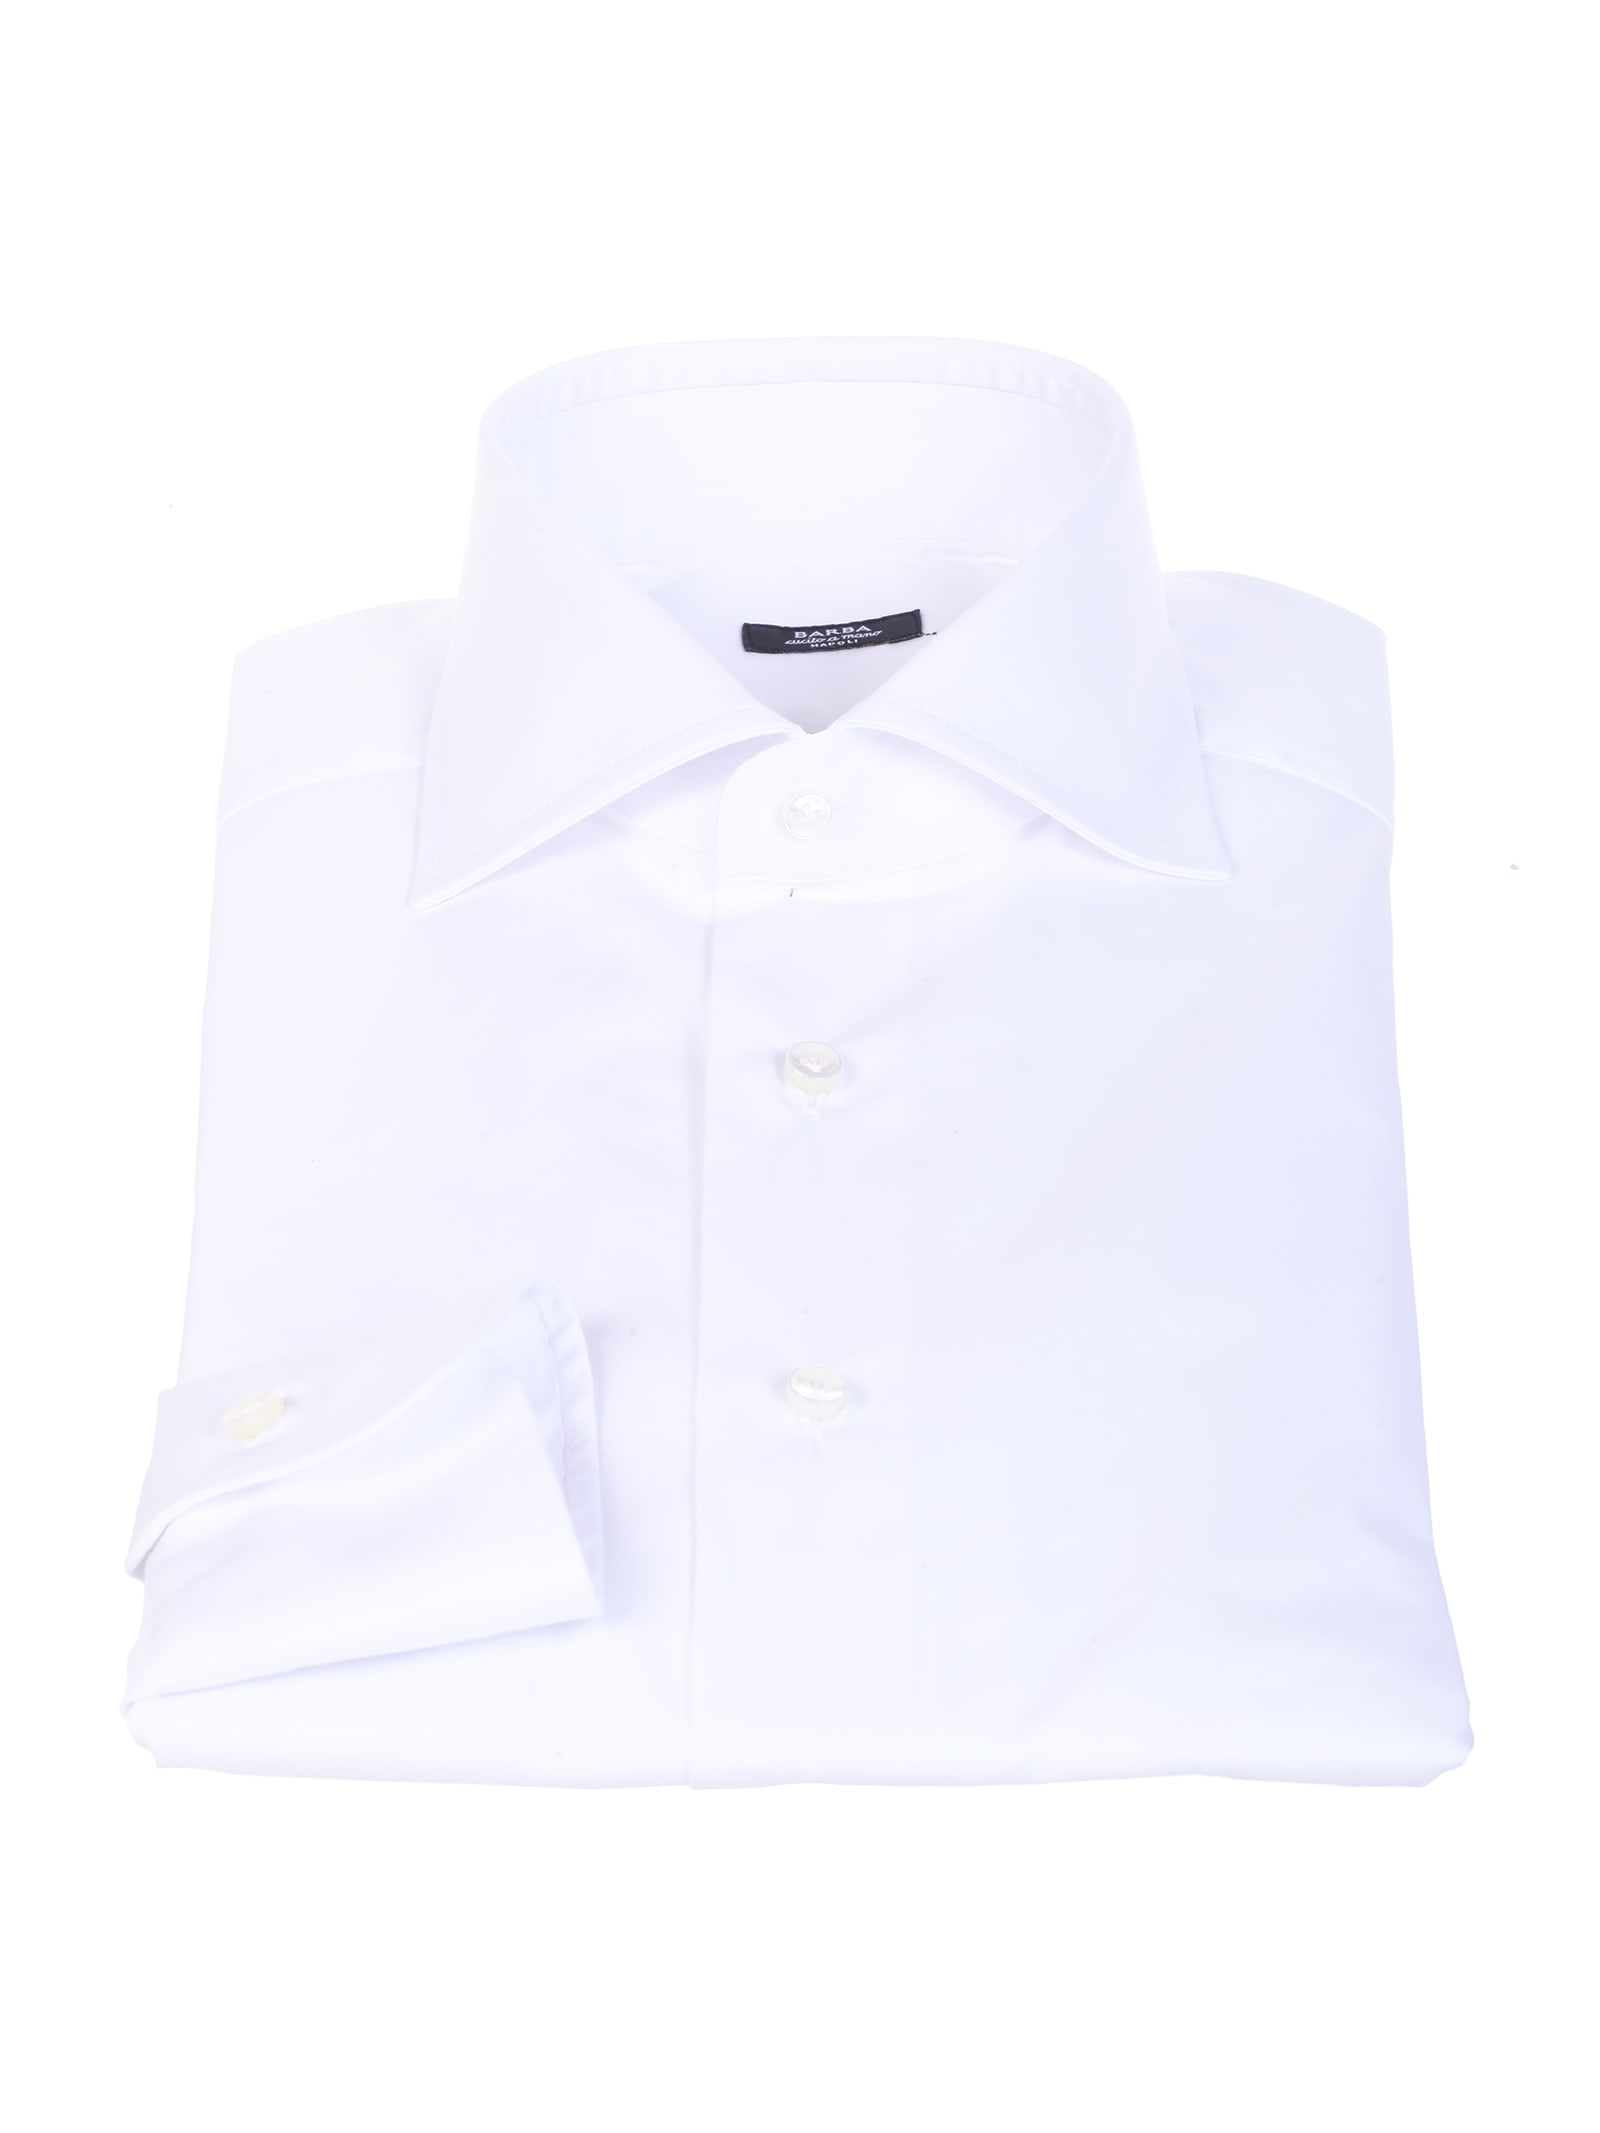 Barba white cotton shirt